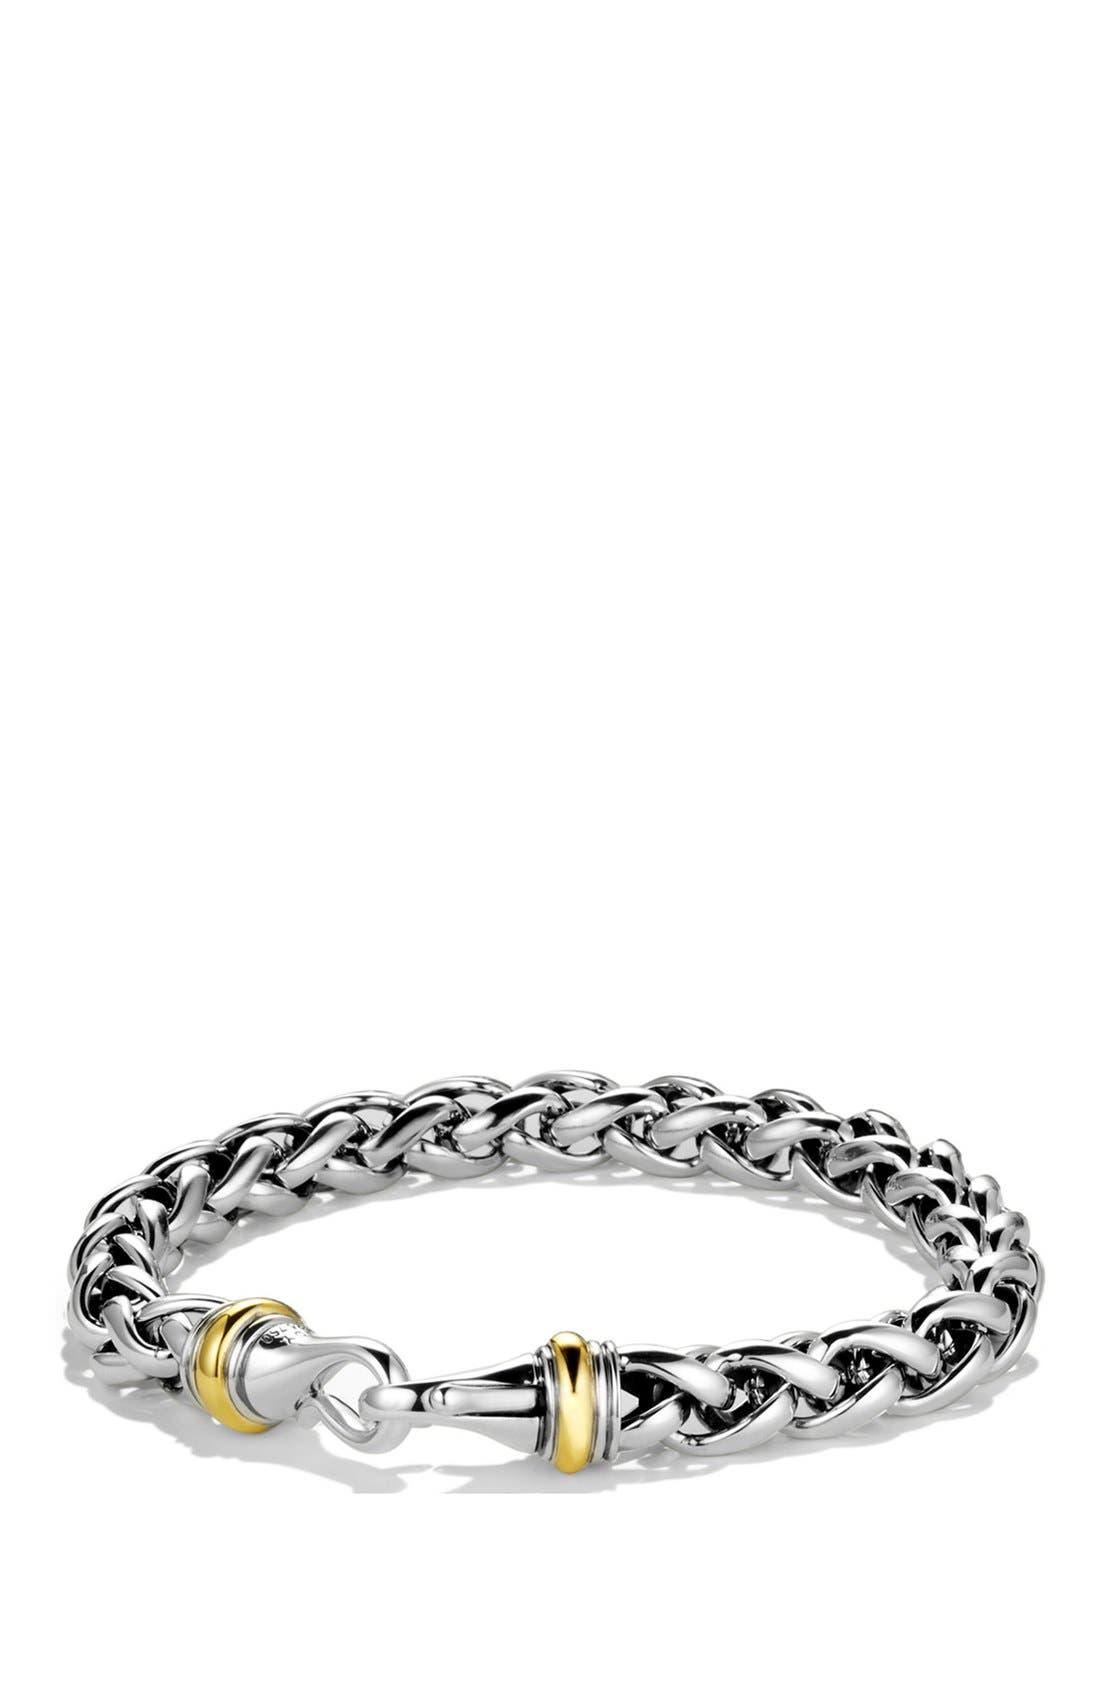 Main Image - David Yurman 'Chain' Large Wheat Chain Bracelet with Gold